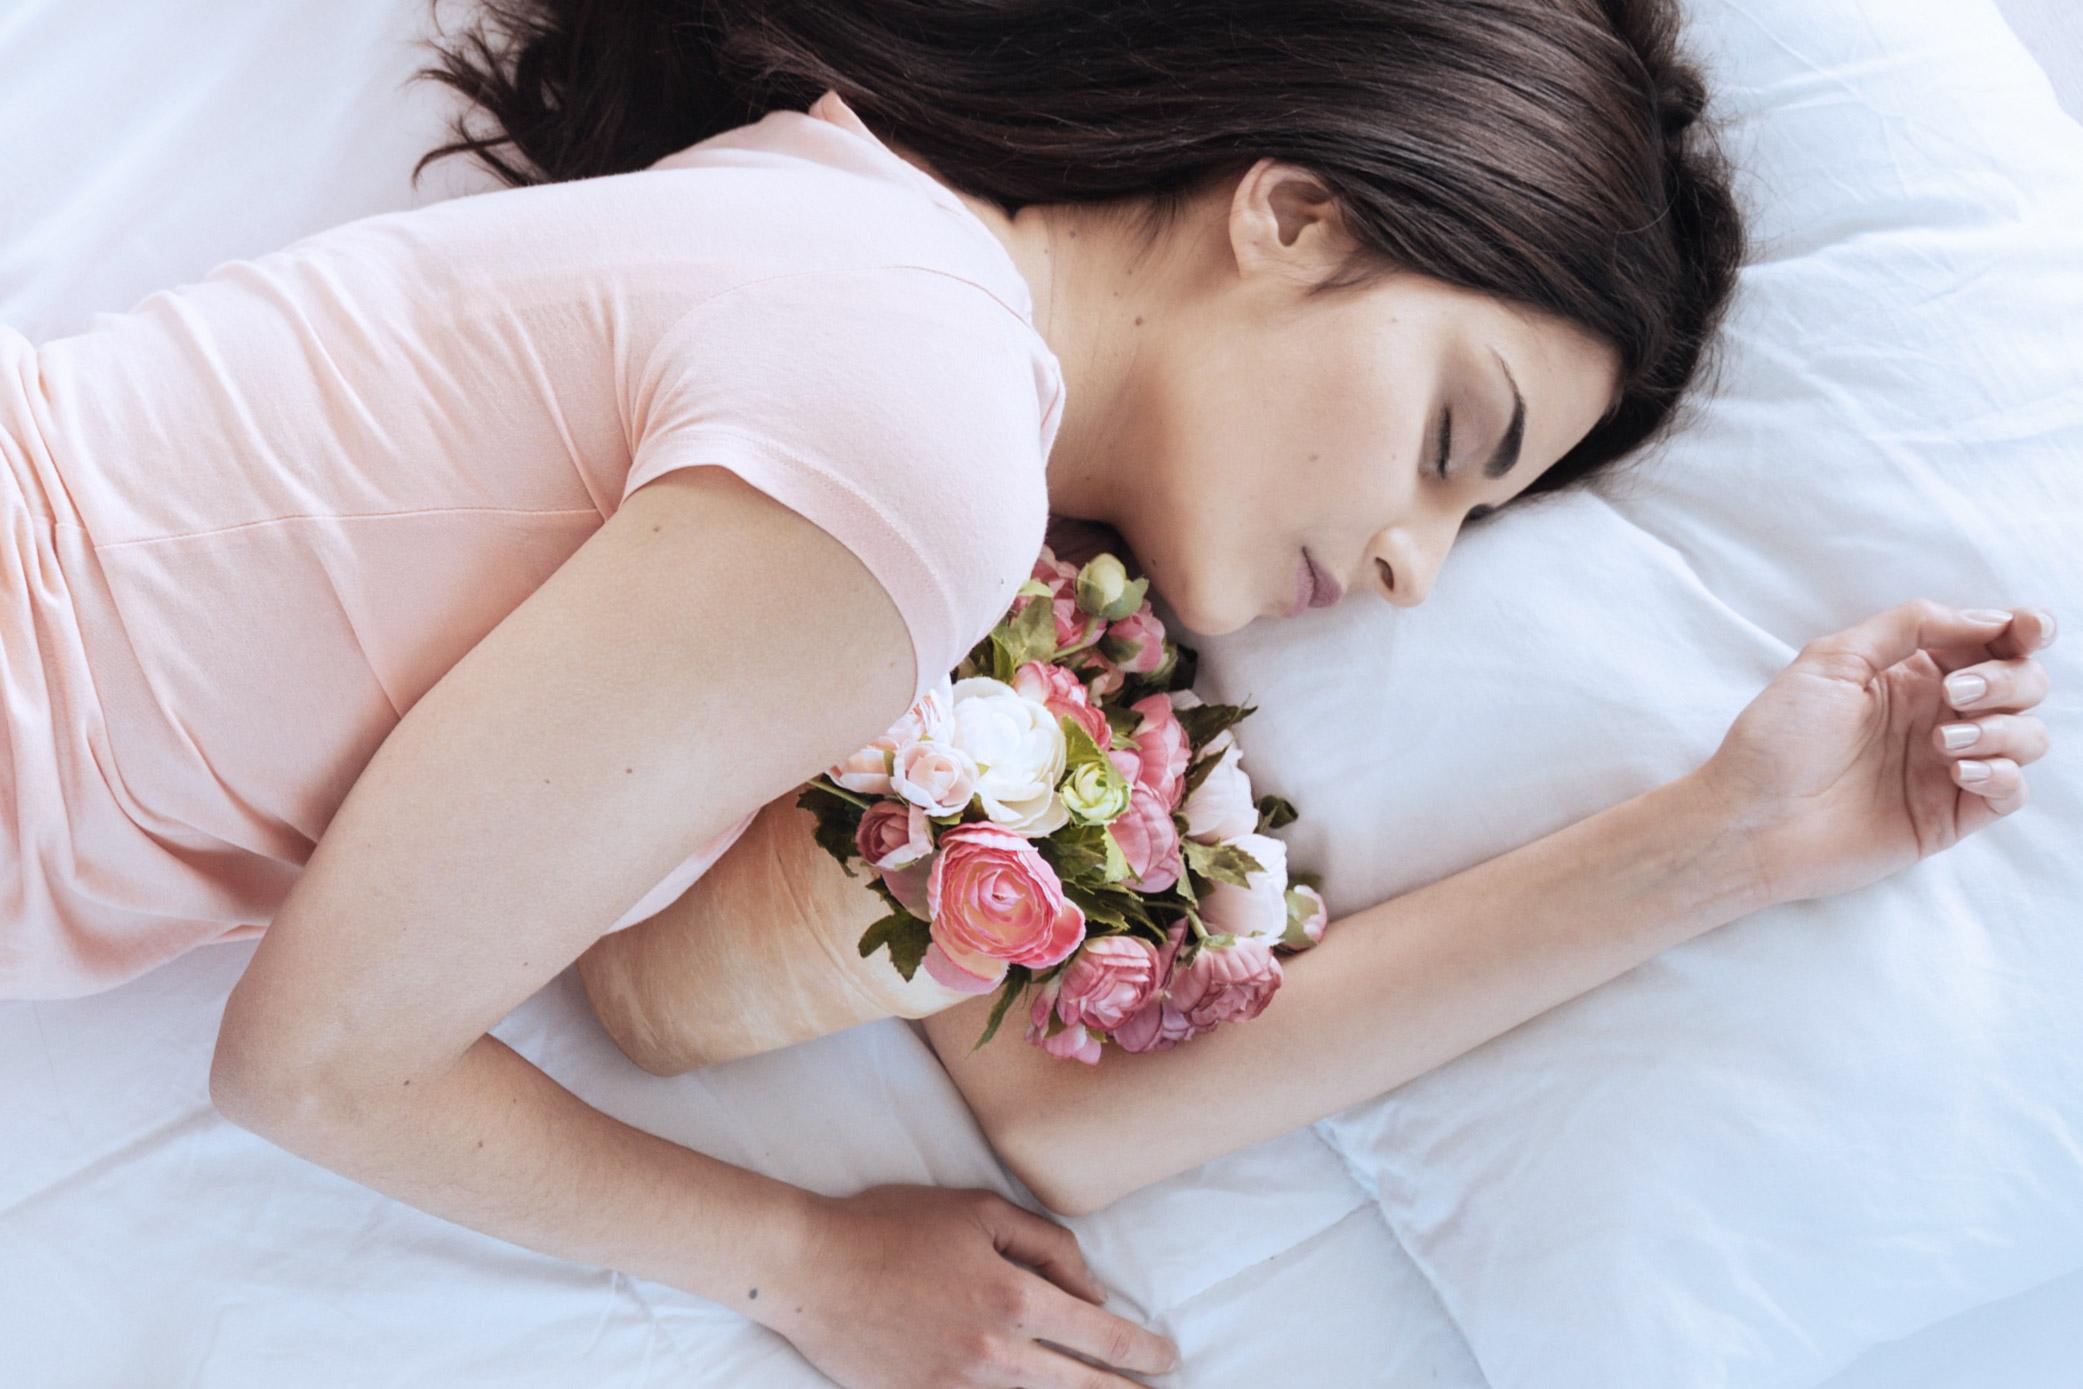 SLEEP - Cannabinoids help facilitate a natural sleep cycle through nervous and endocannabinoid systems.